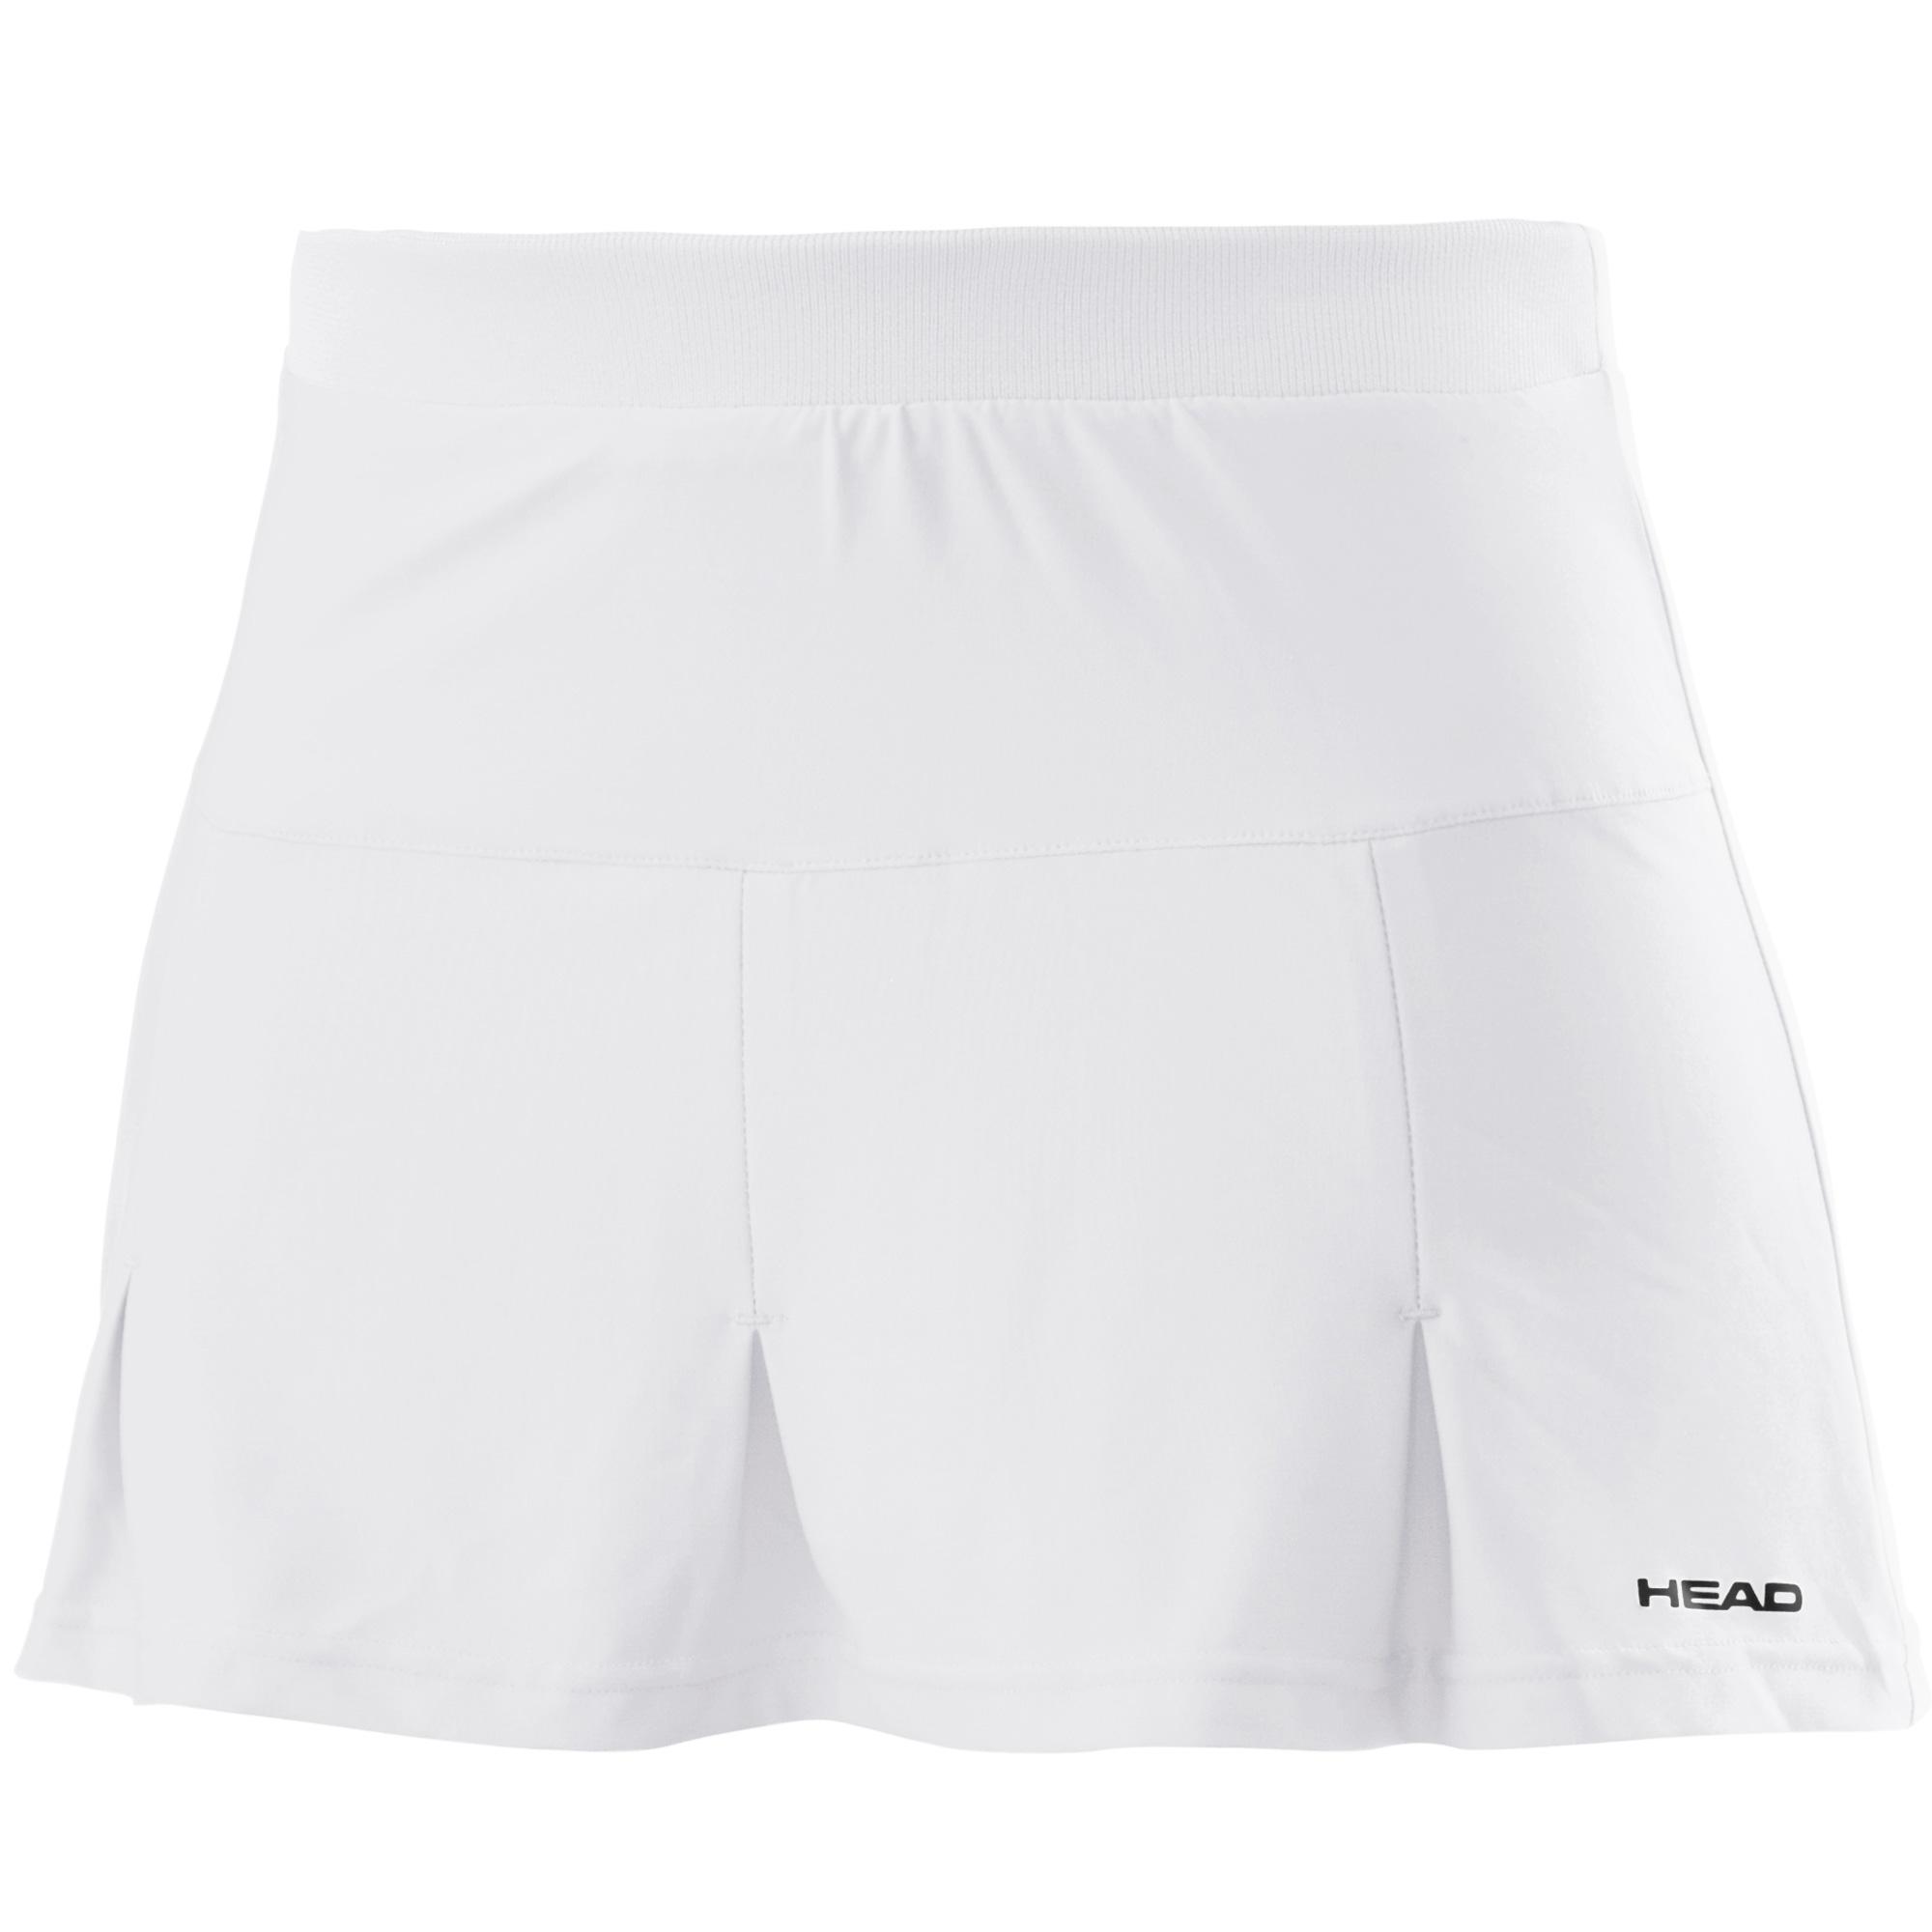 Head Club Basic Girls Skort - White, L